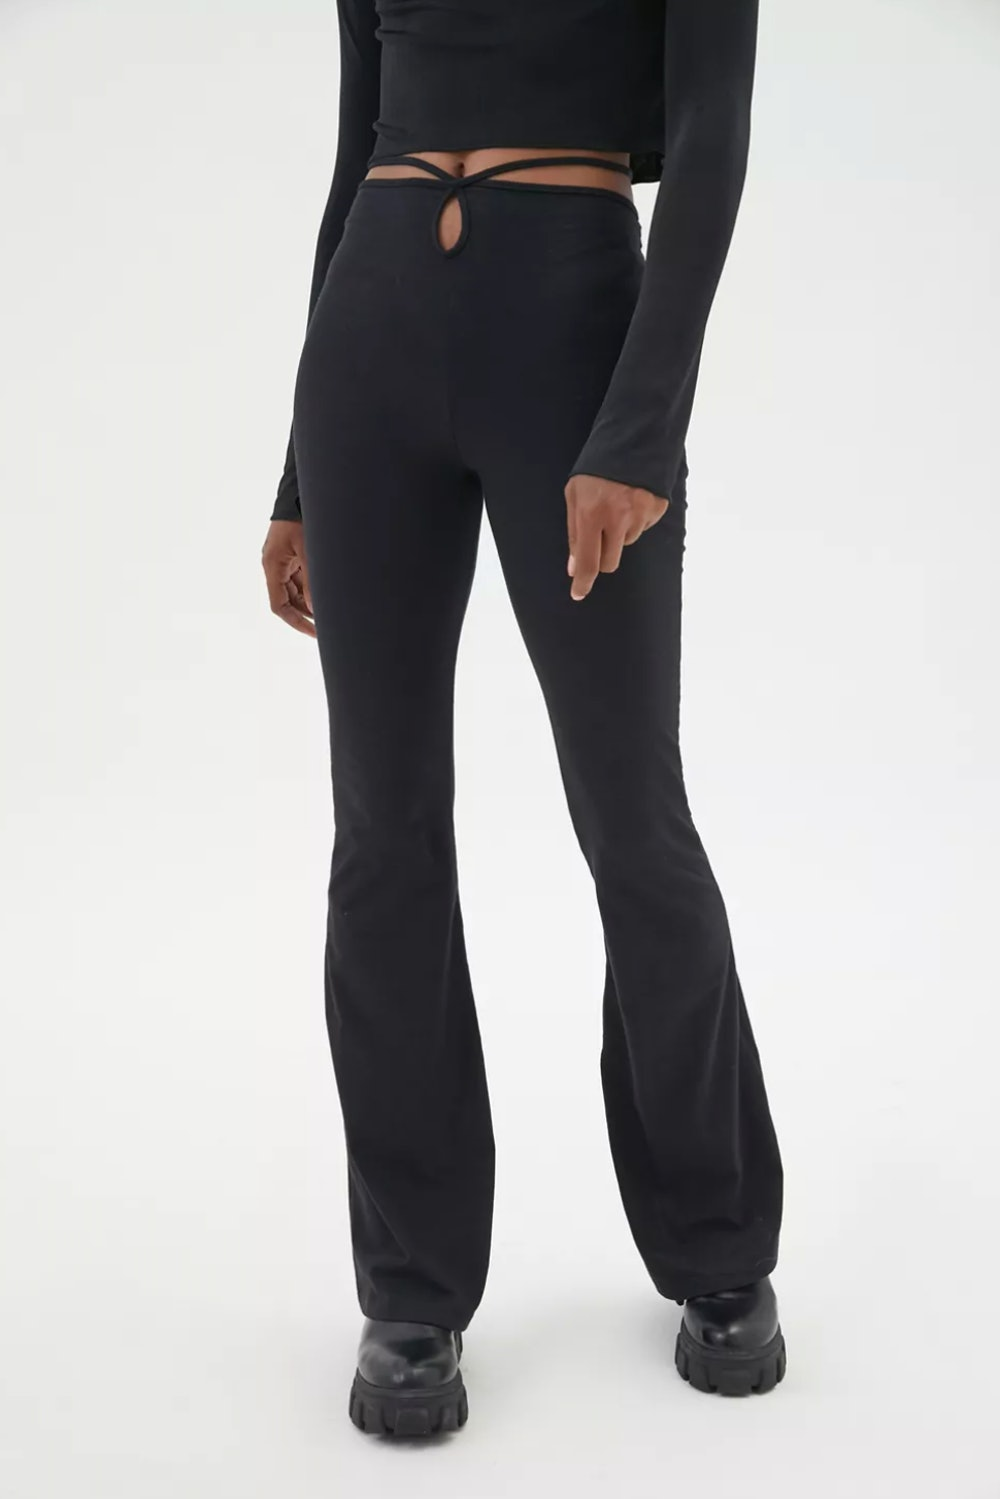 Motel Sekar Strappy Tie-Back Flare Pant